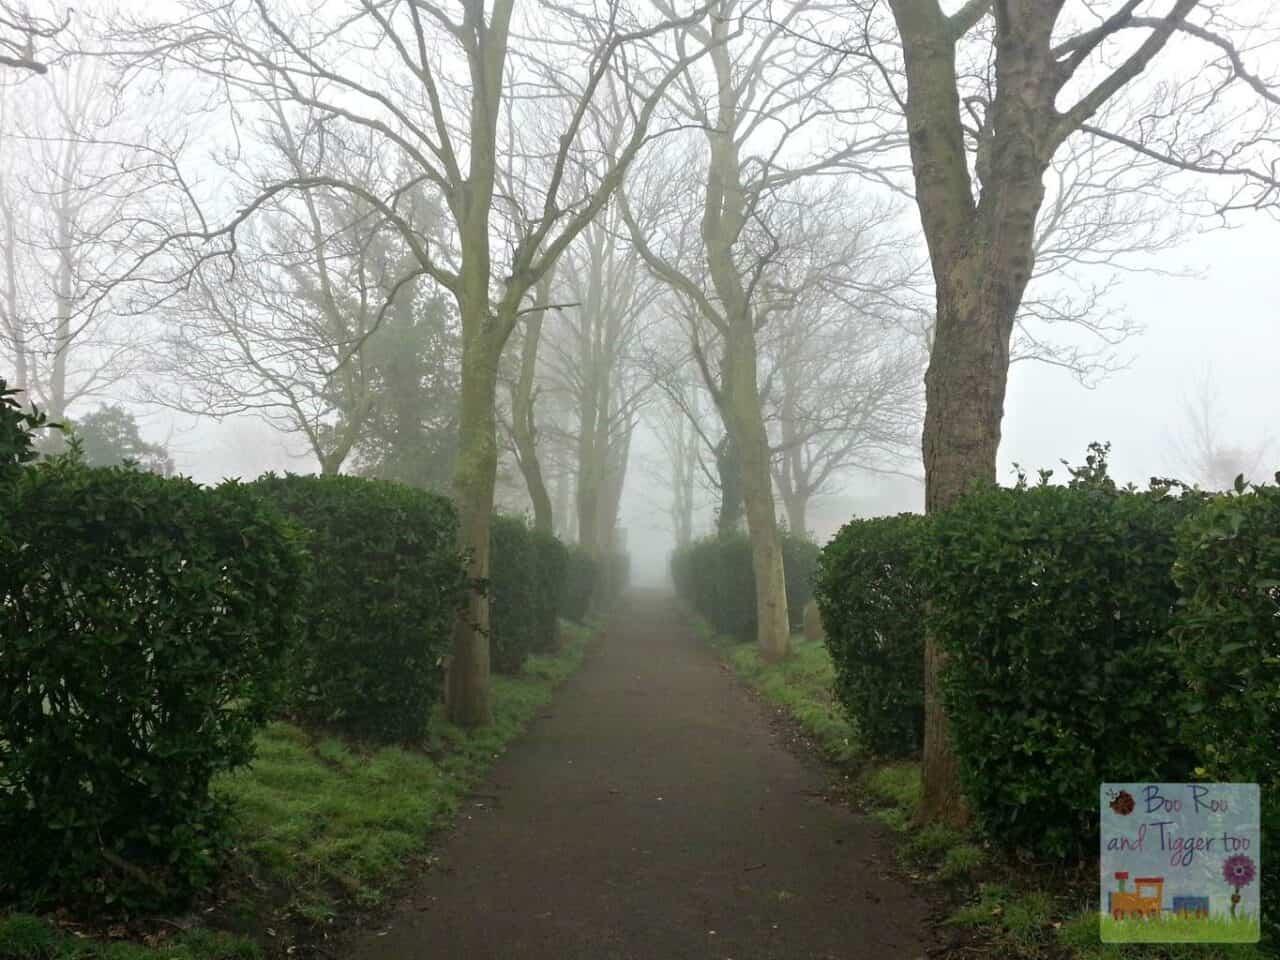 Photo of the week #SilentSunday #MySundayPhoto - Graveyard